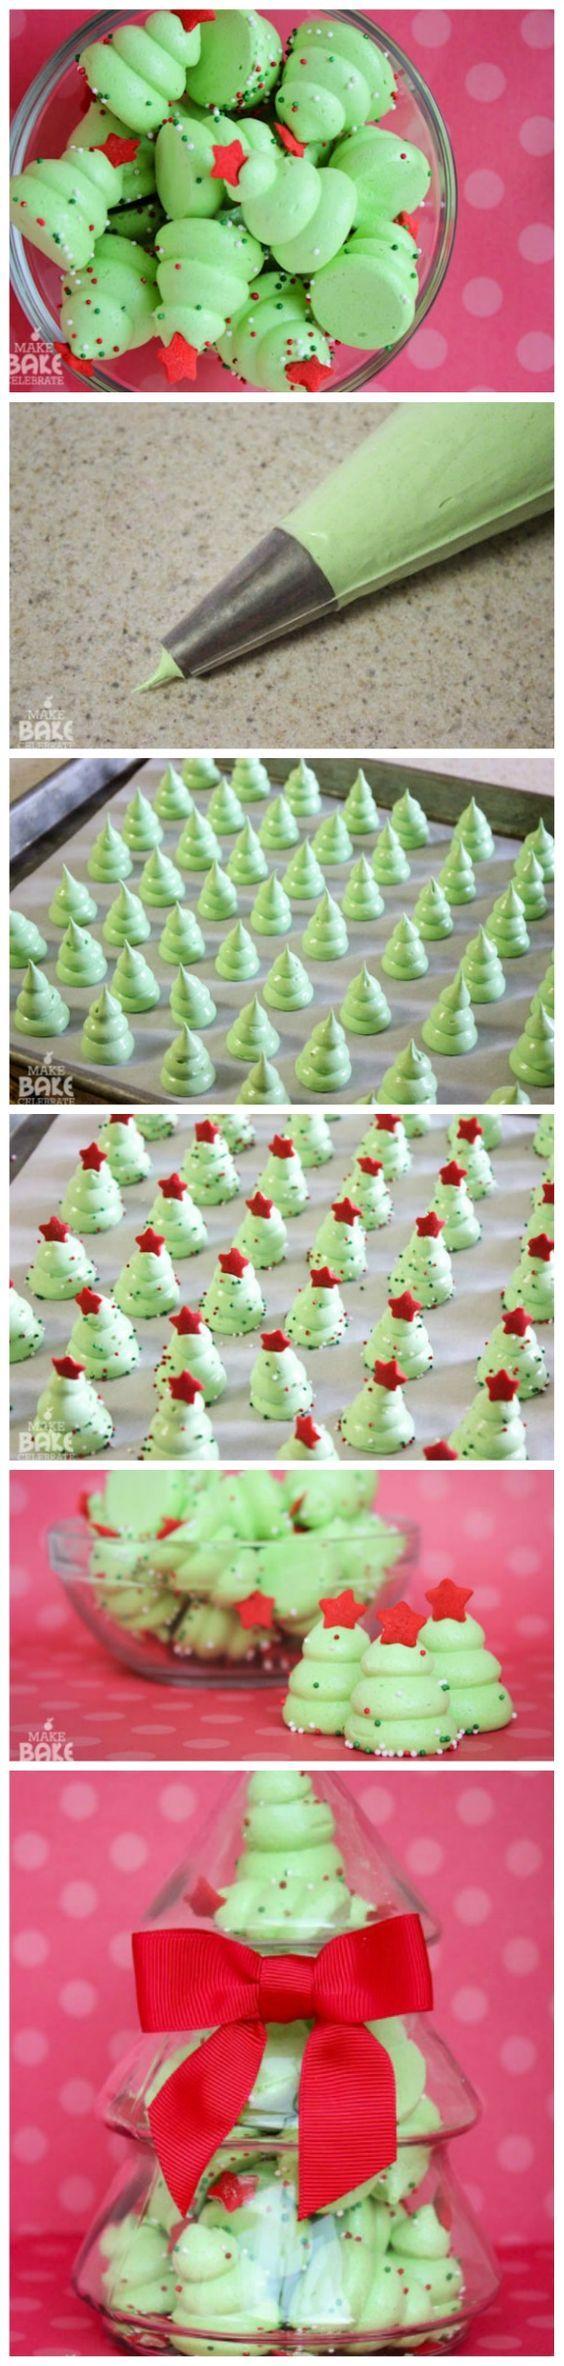 25 Fun To Make Xmas Treats To Try This Christmas.